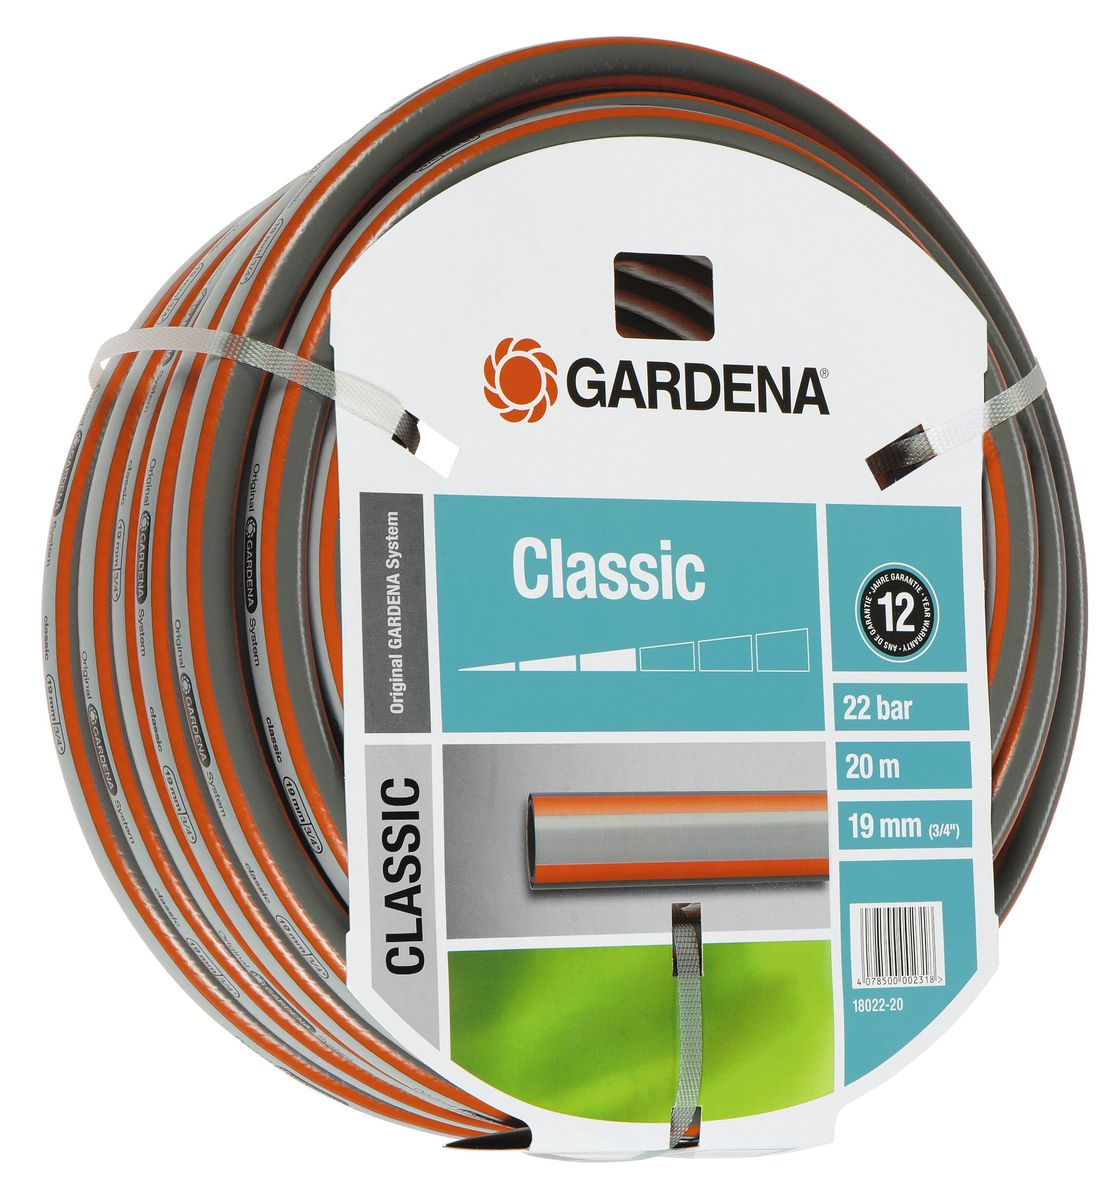 Шланг Gardena Classic, 19 мм (3/4) х 20 м шланг raco classic 3 4x25m 40306 3 4 25